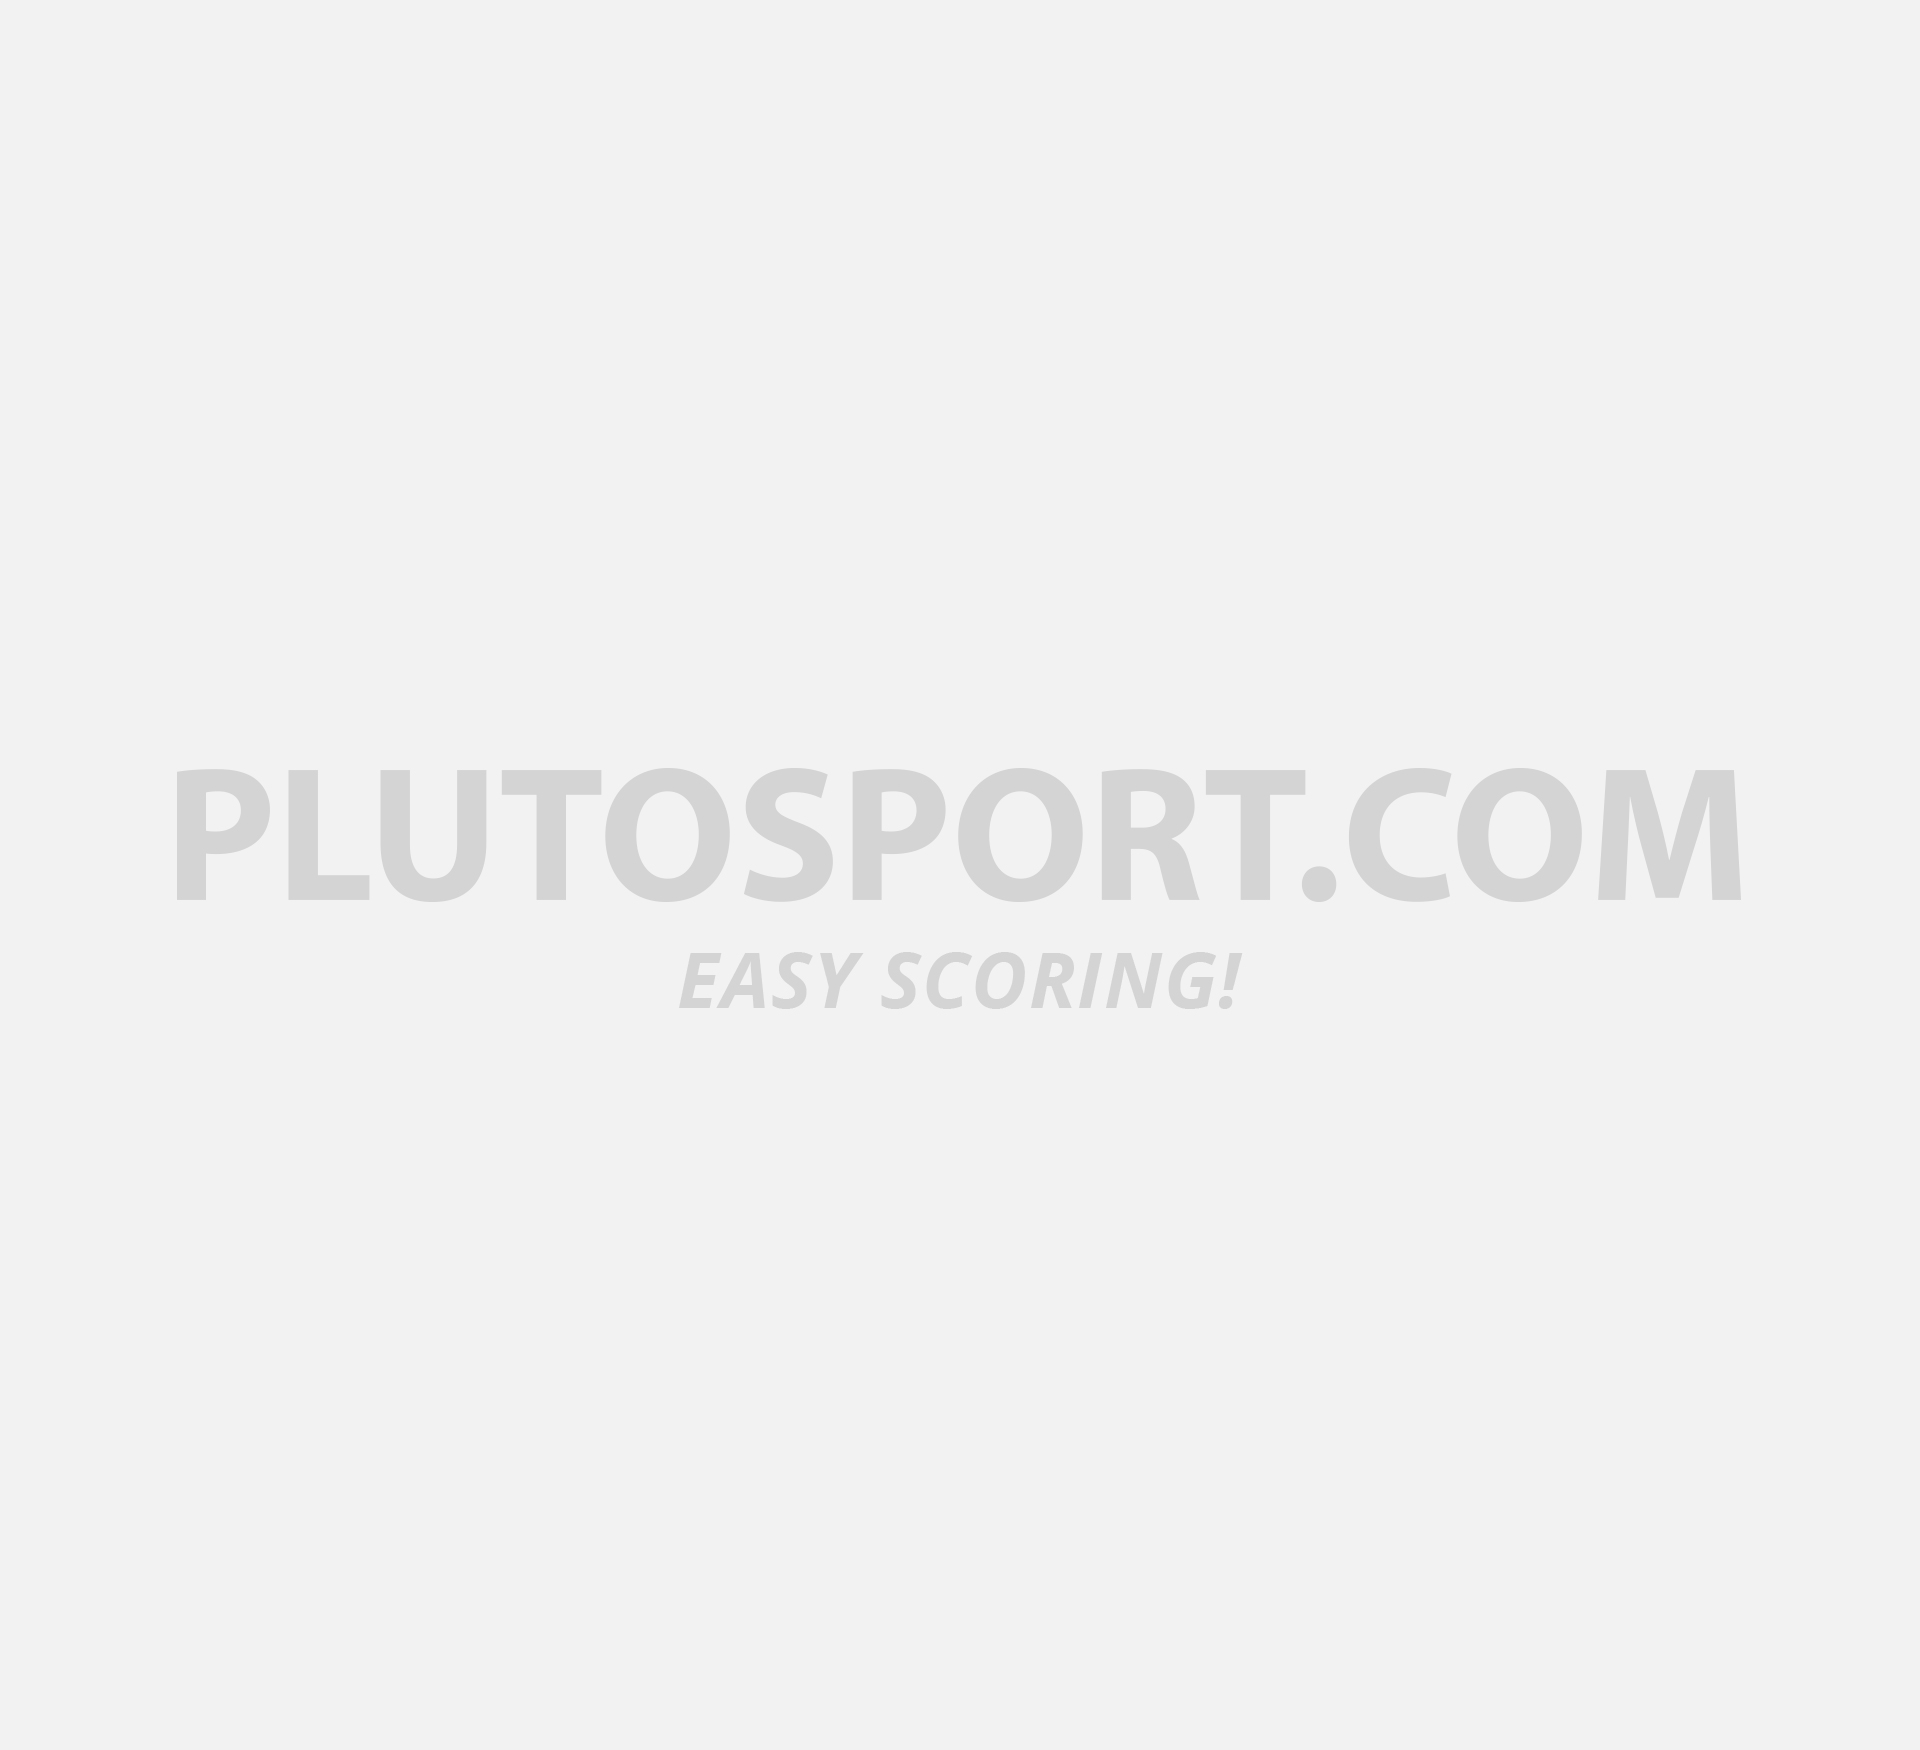 Nike Benassi JDI - Bath slippers - Flip flops - Shoes - Lifestyle - Women |  Plutosport